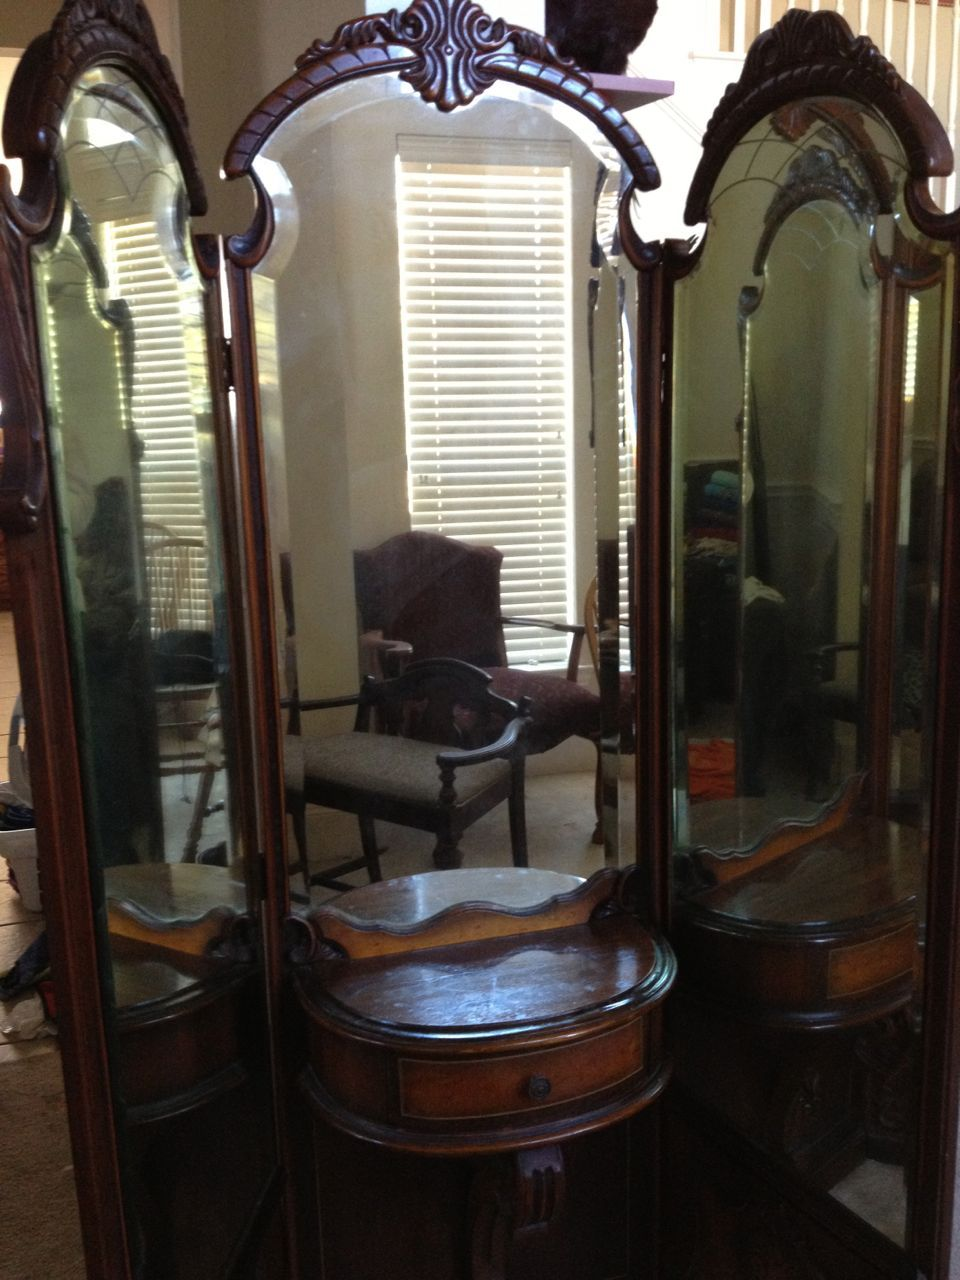 Early 1900s Vanity 3 Way Mirror And Dresser Set 3 Way Mirrors Mirrors For Sale Diy Vanity Mirror